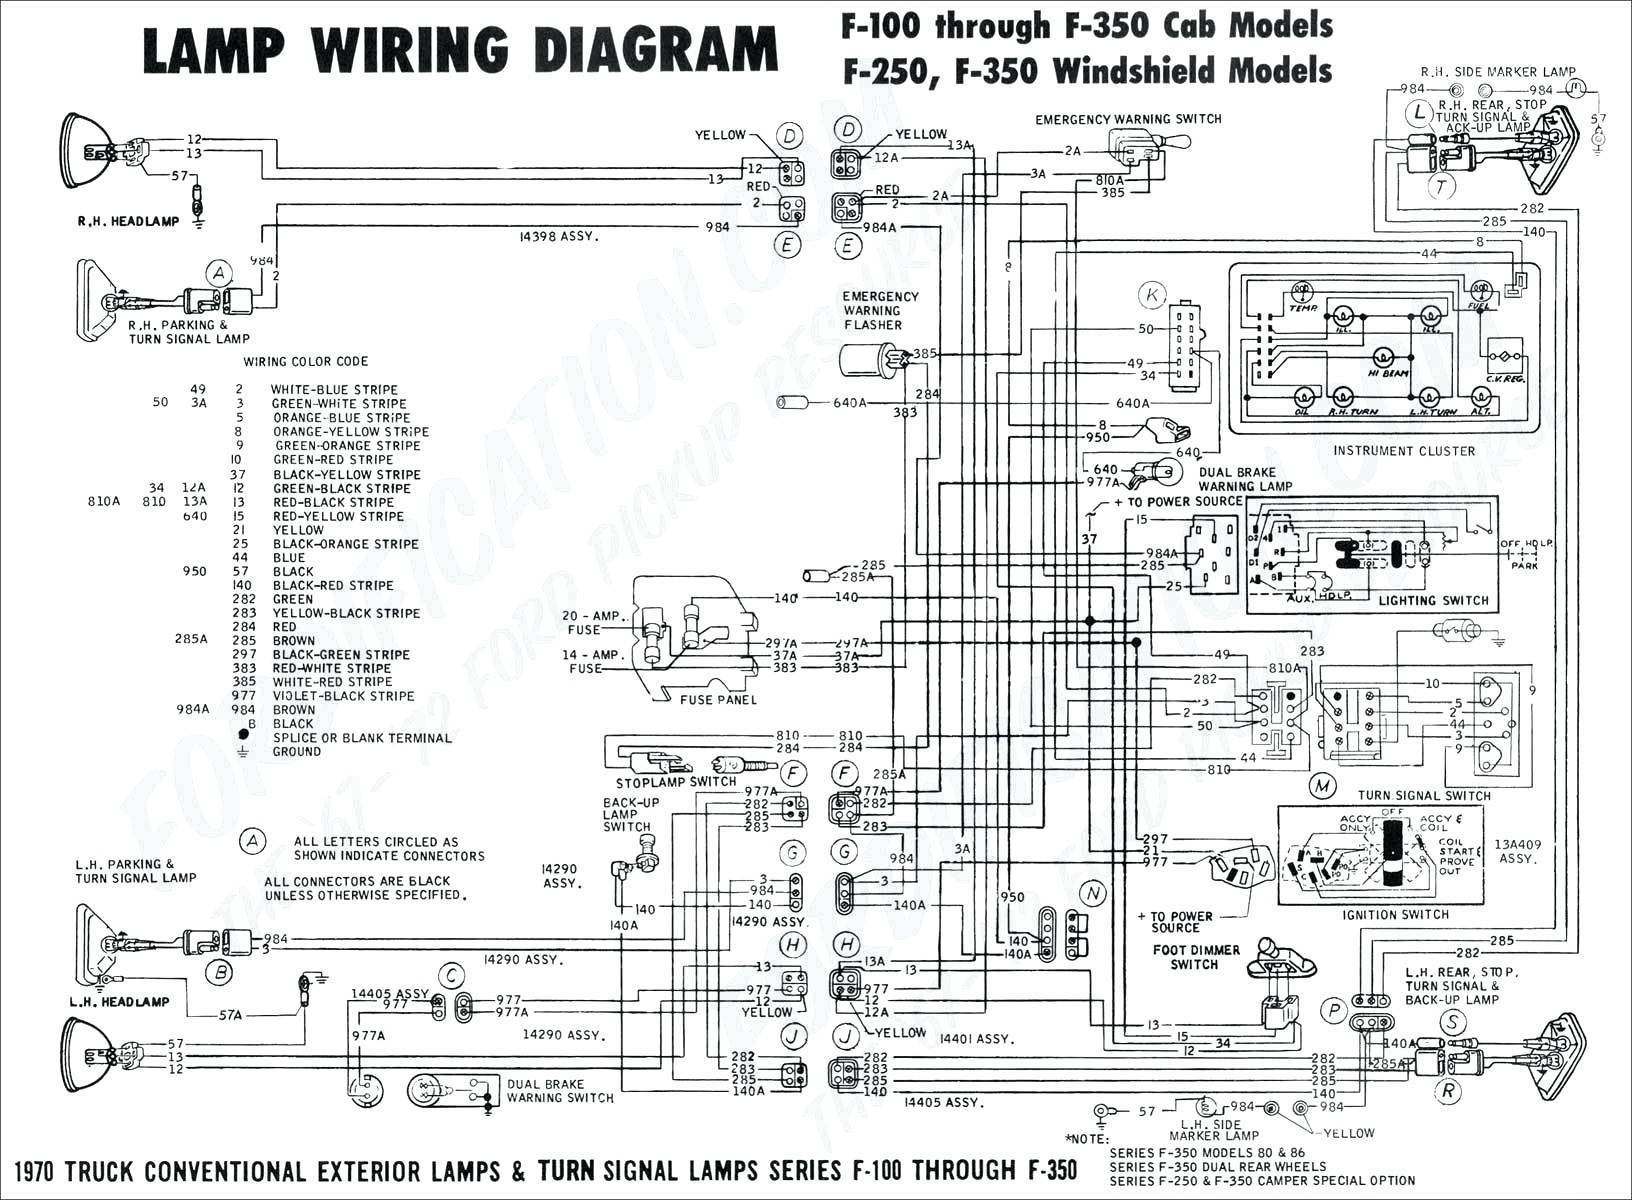 [DIAGRAM] 1997 Blue Bird Wiring Diagram Cluster FULL